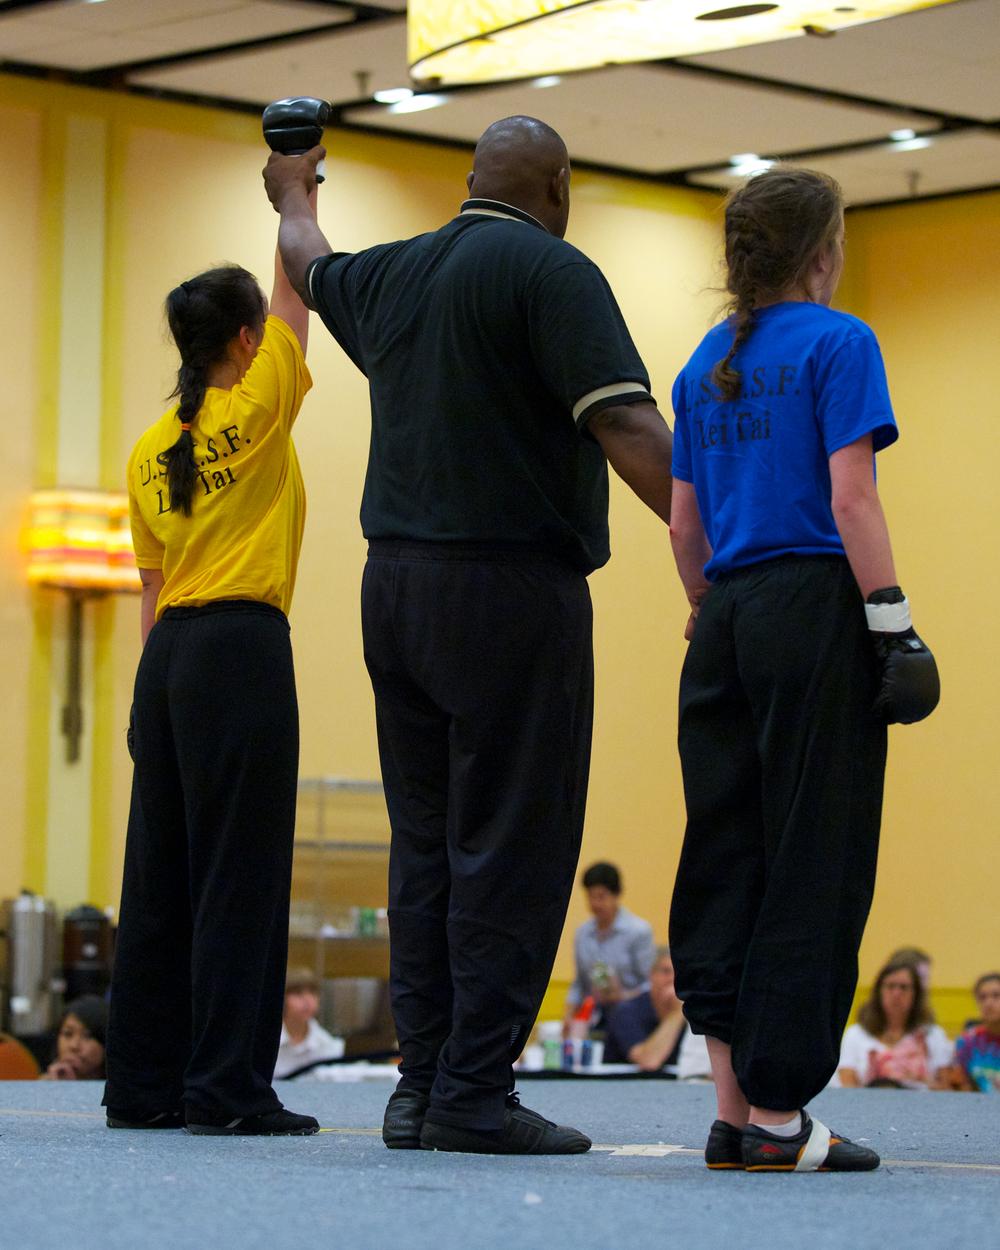 2012-07-28_Baltimore B-0208.jpg